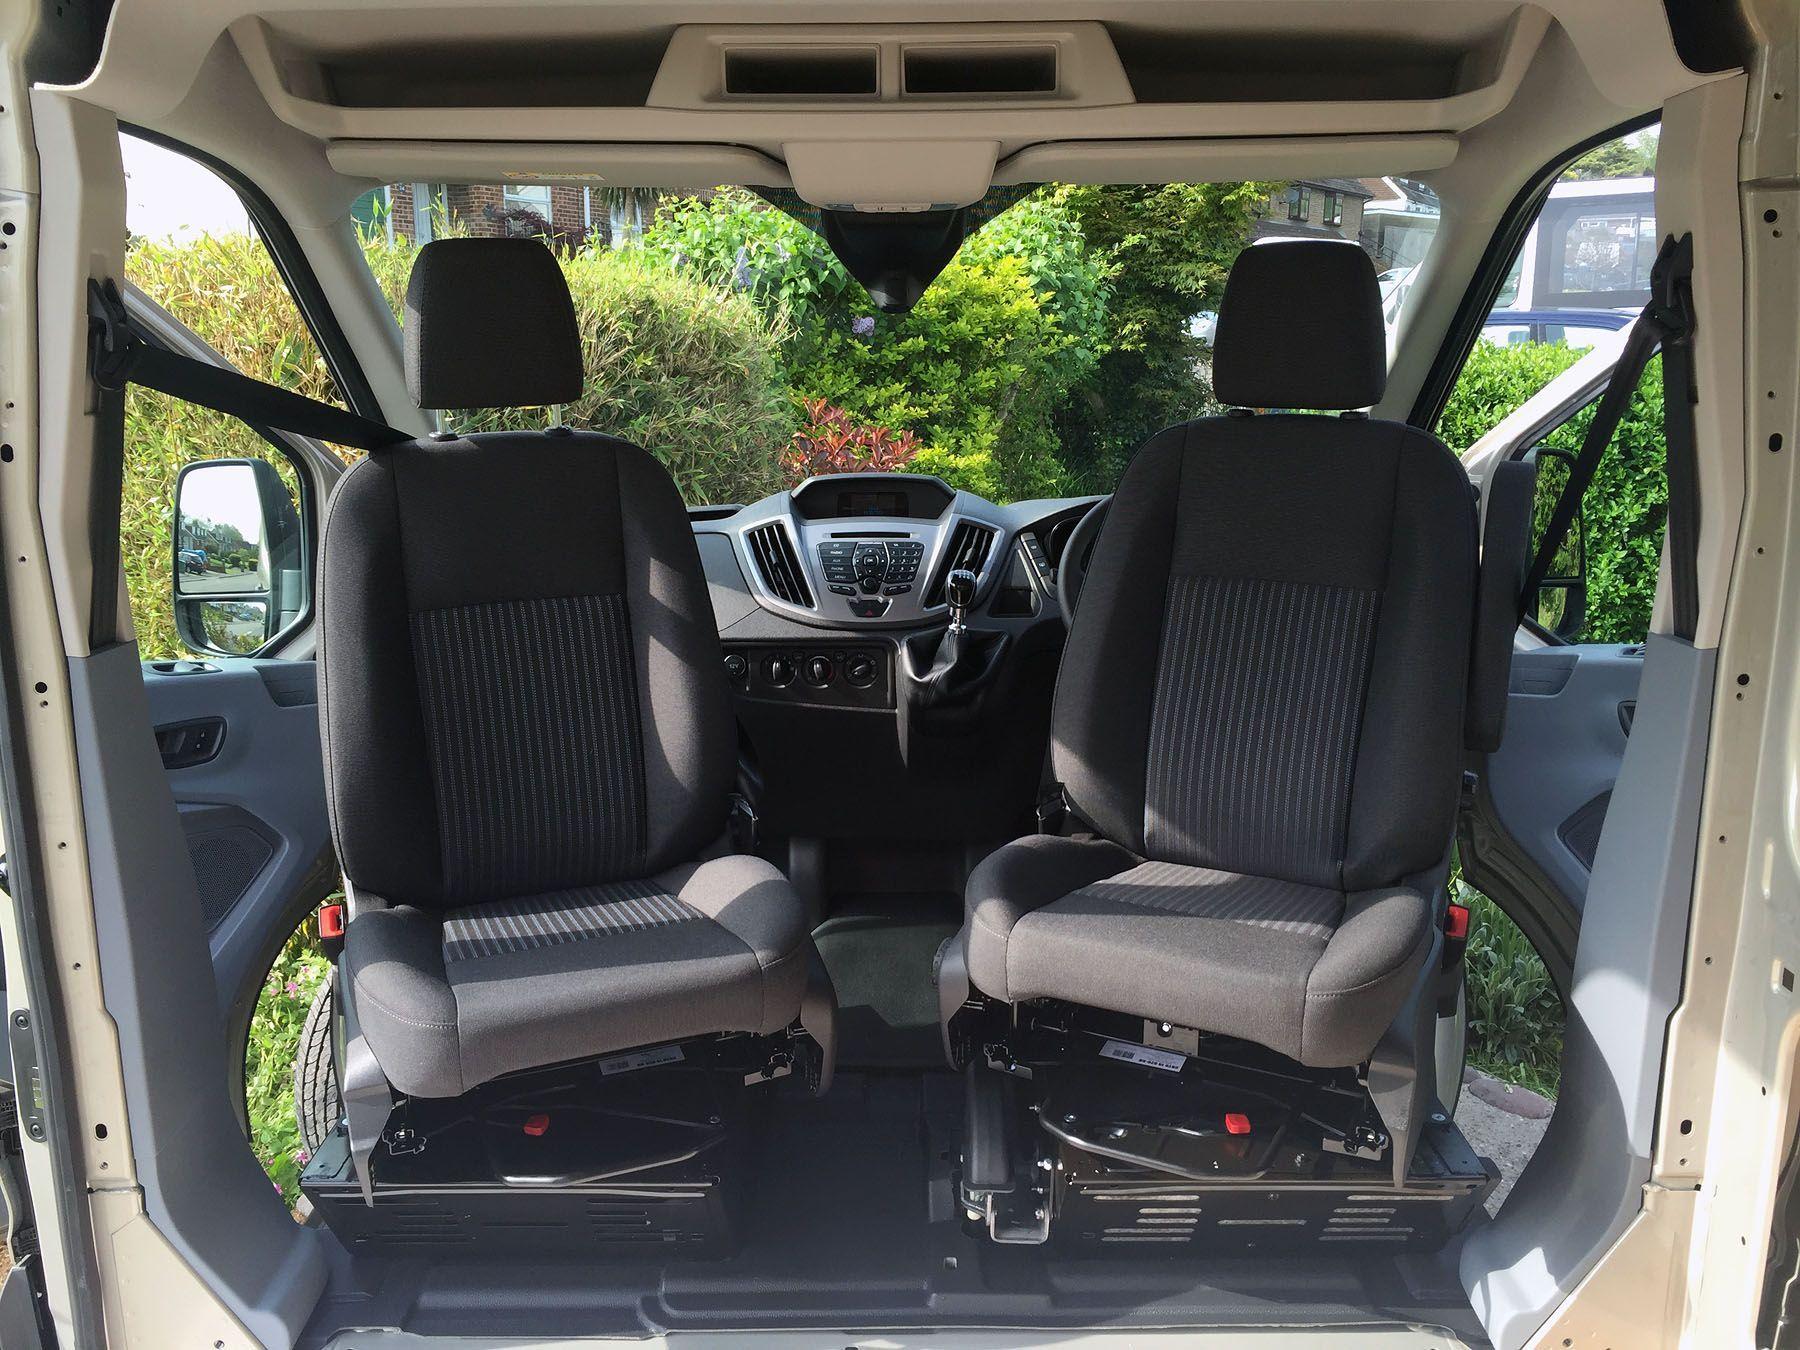 ford transit custom front single passenger seat tanzkurs single wien